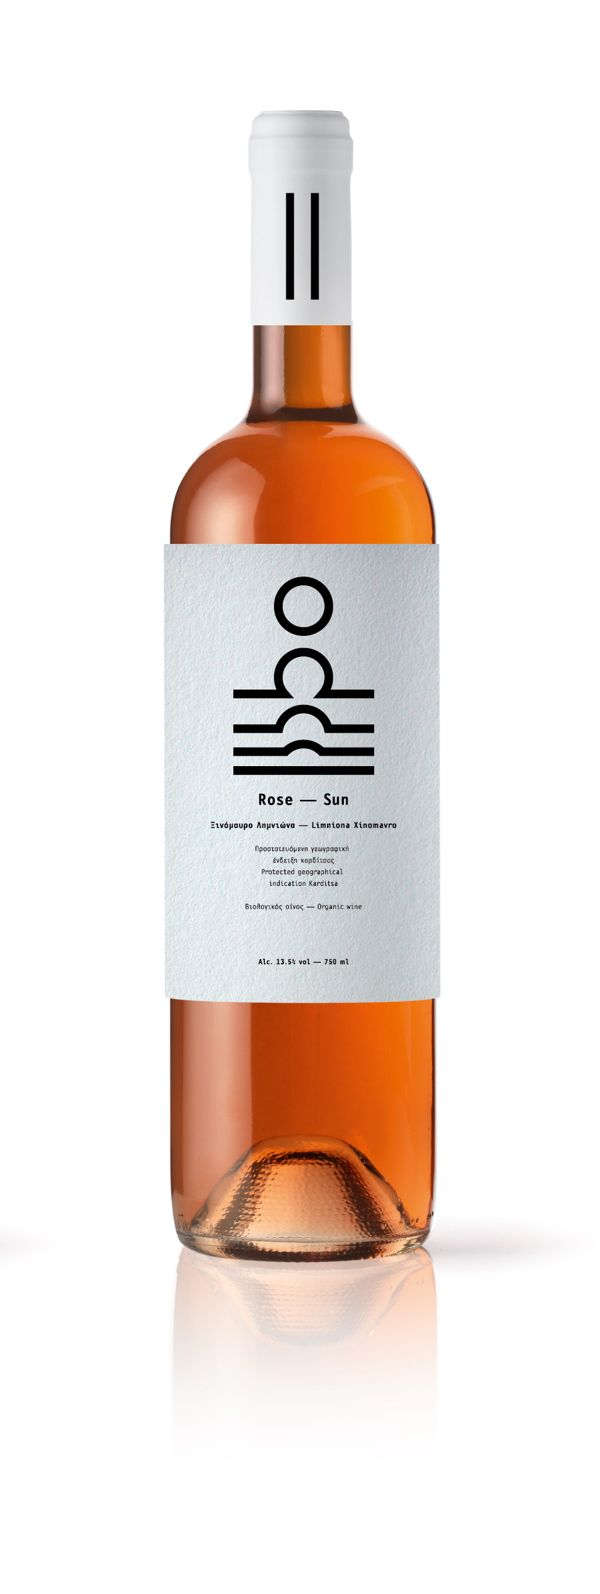 #rose #wine #packaging #taninotanino #vinosinteligentes